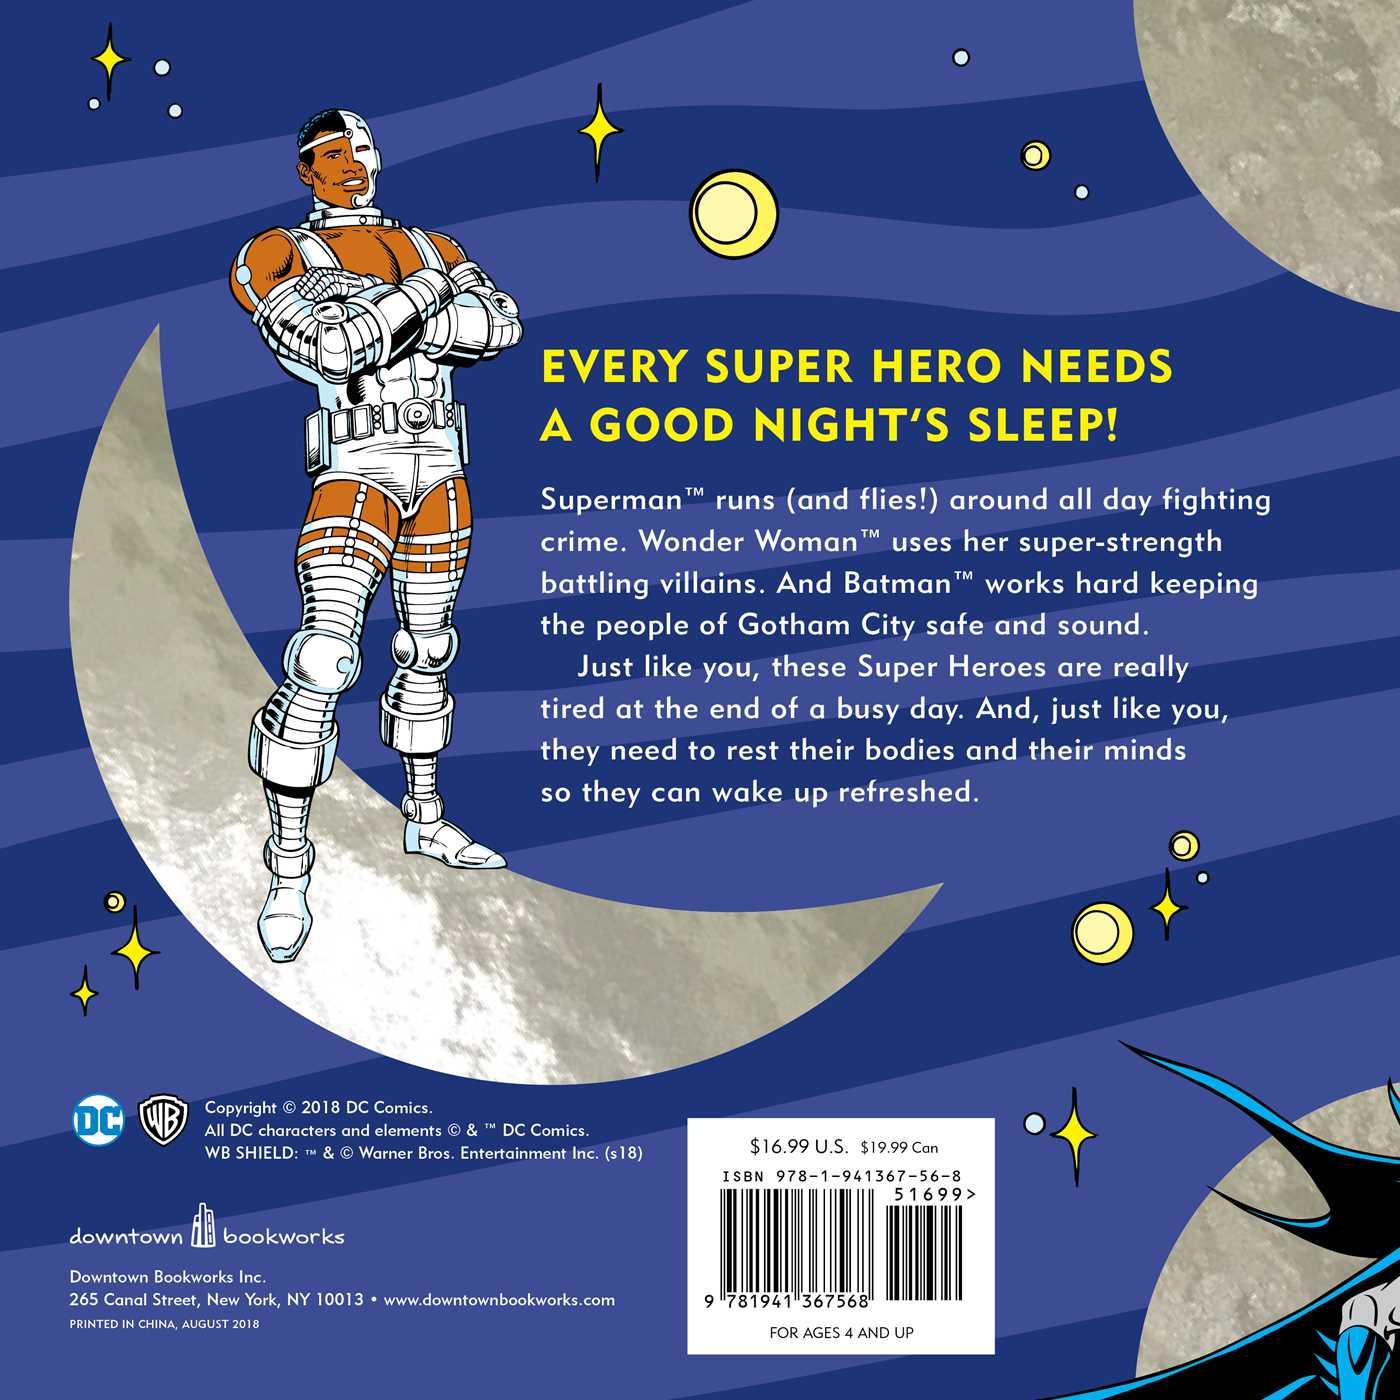 The big book of super hero bedtime stories 9781941367568 hr back